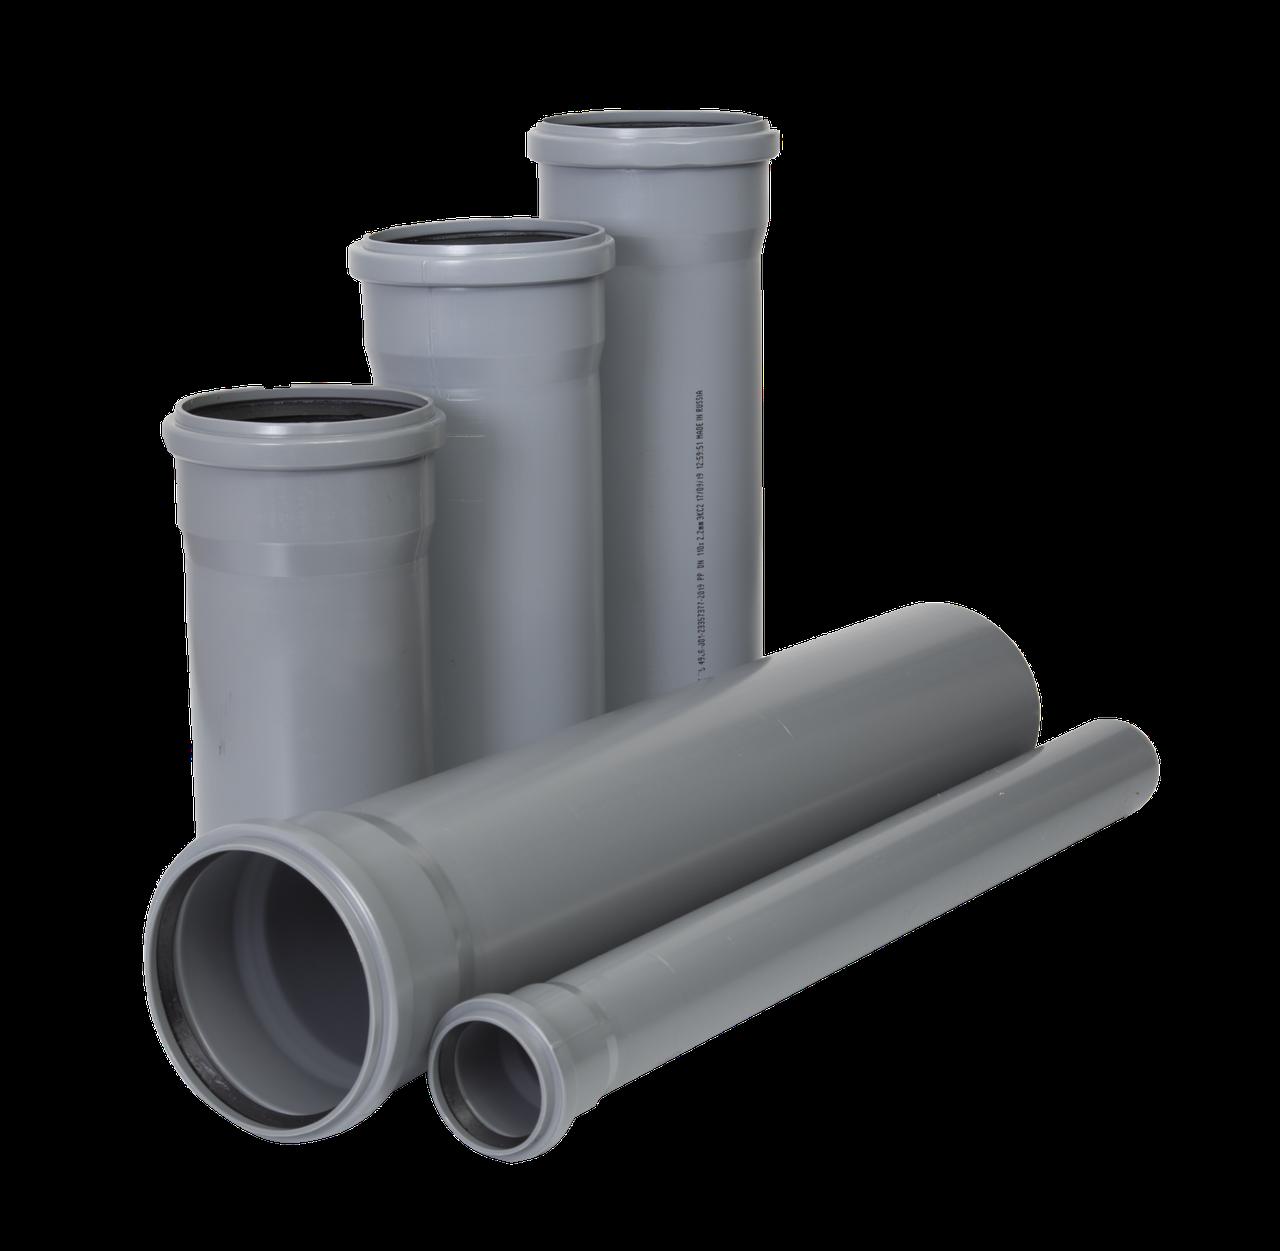 Труба канализационная ПВХ 3,2 мм - 4 мм